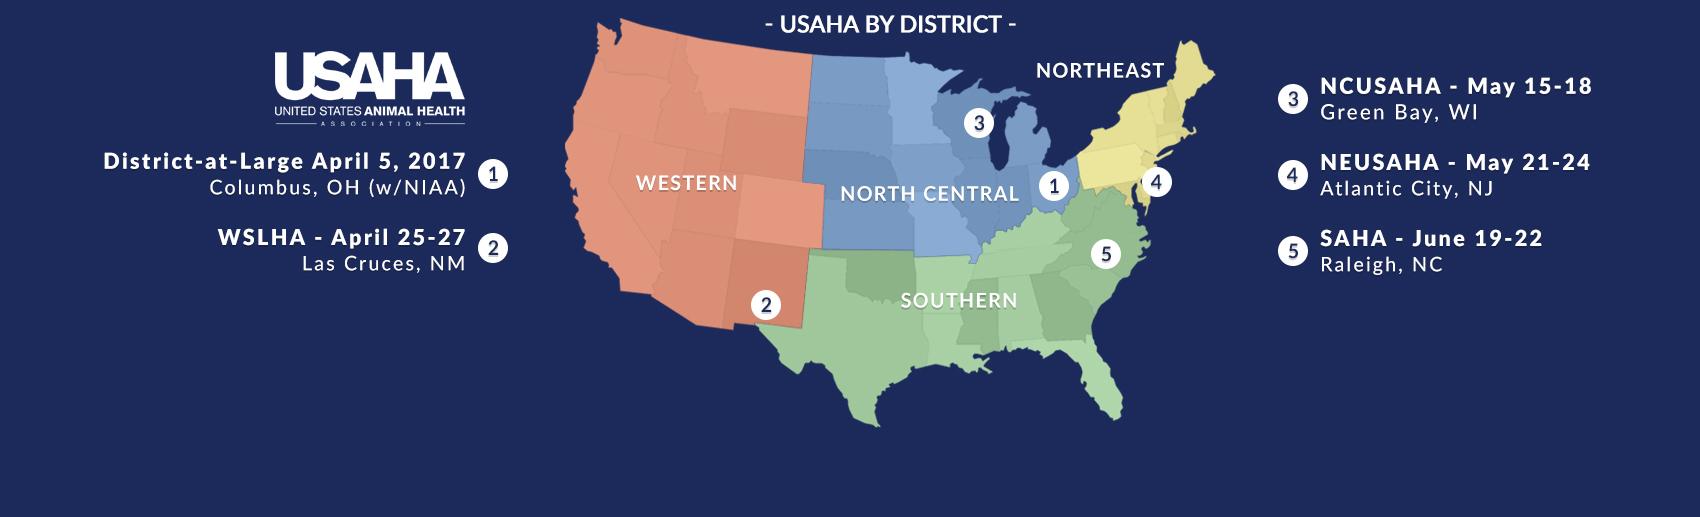 USAHA District Meetings